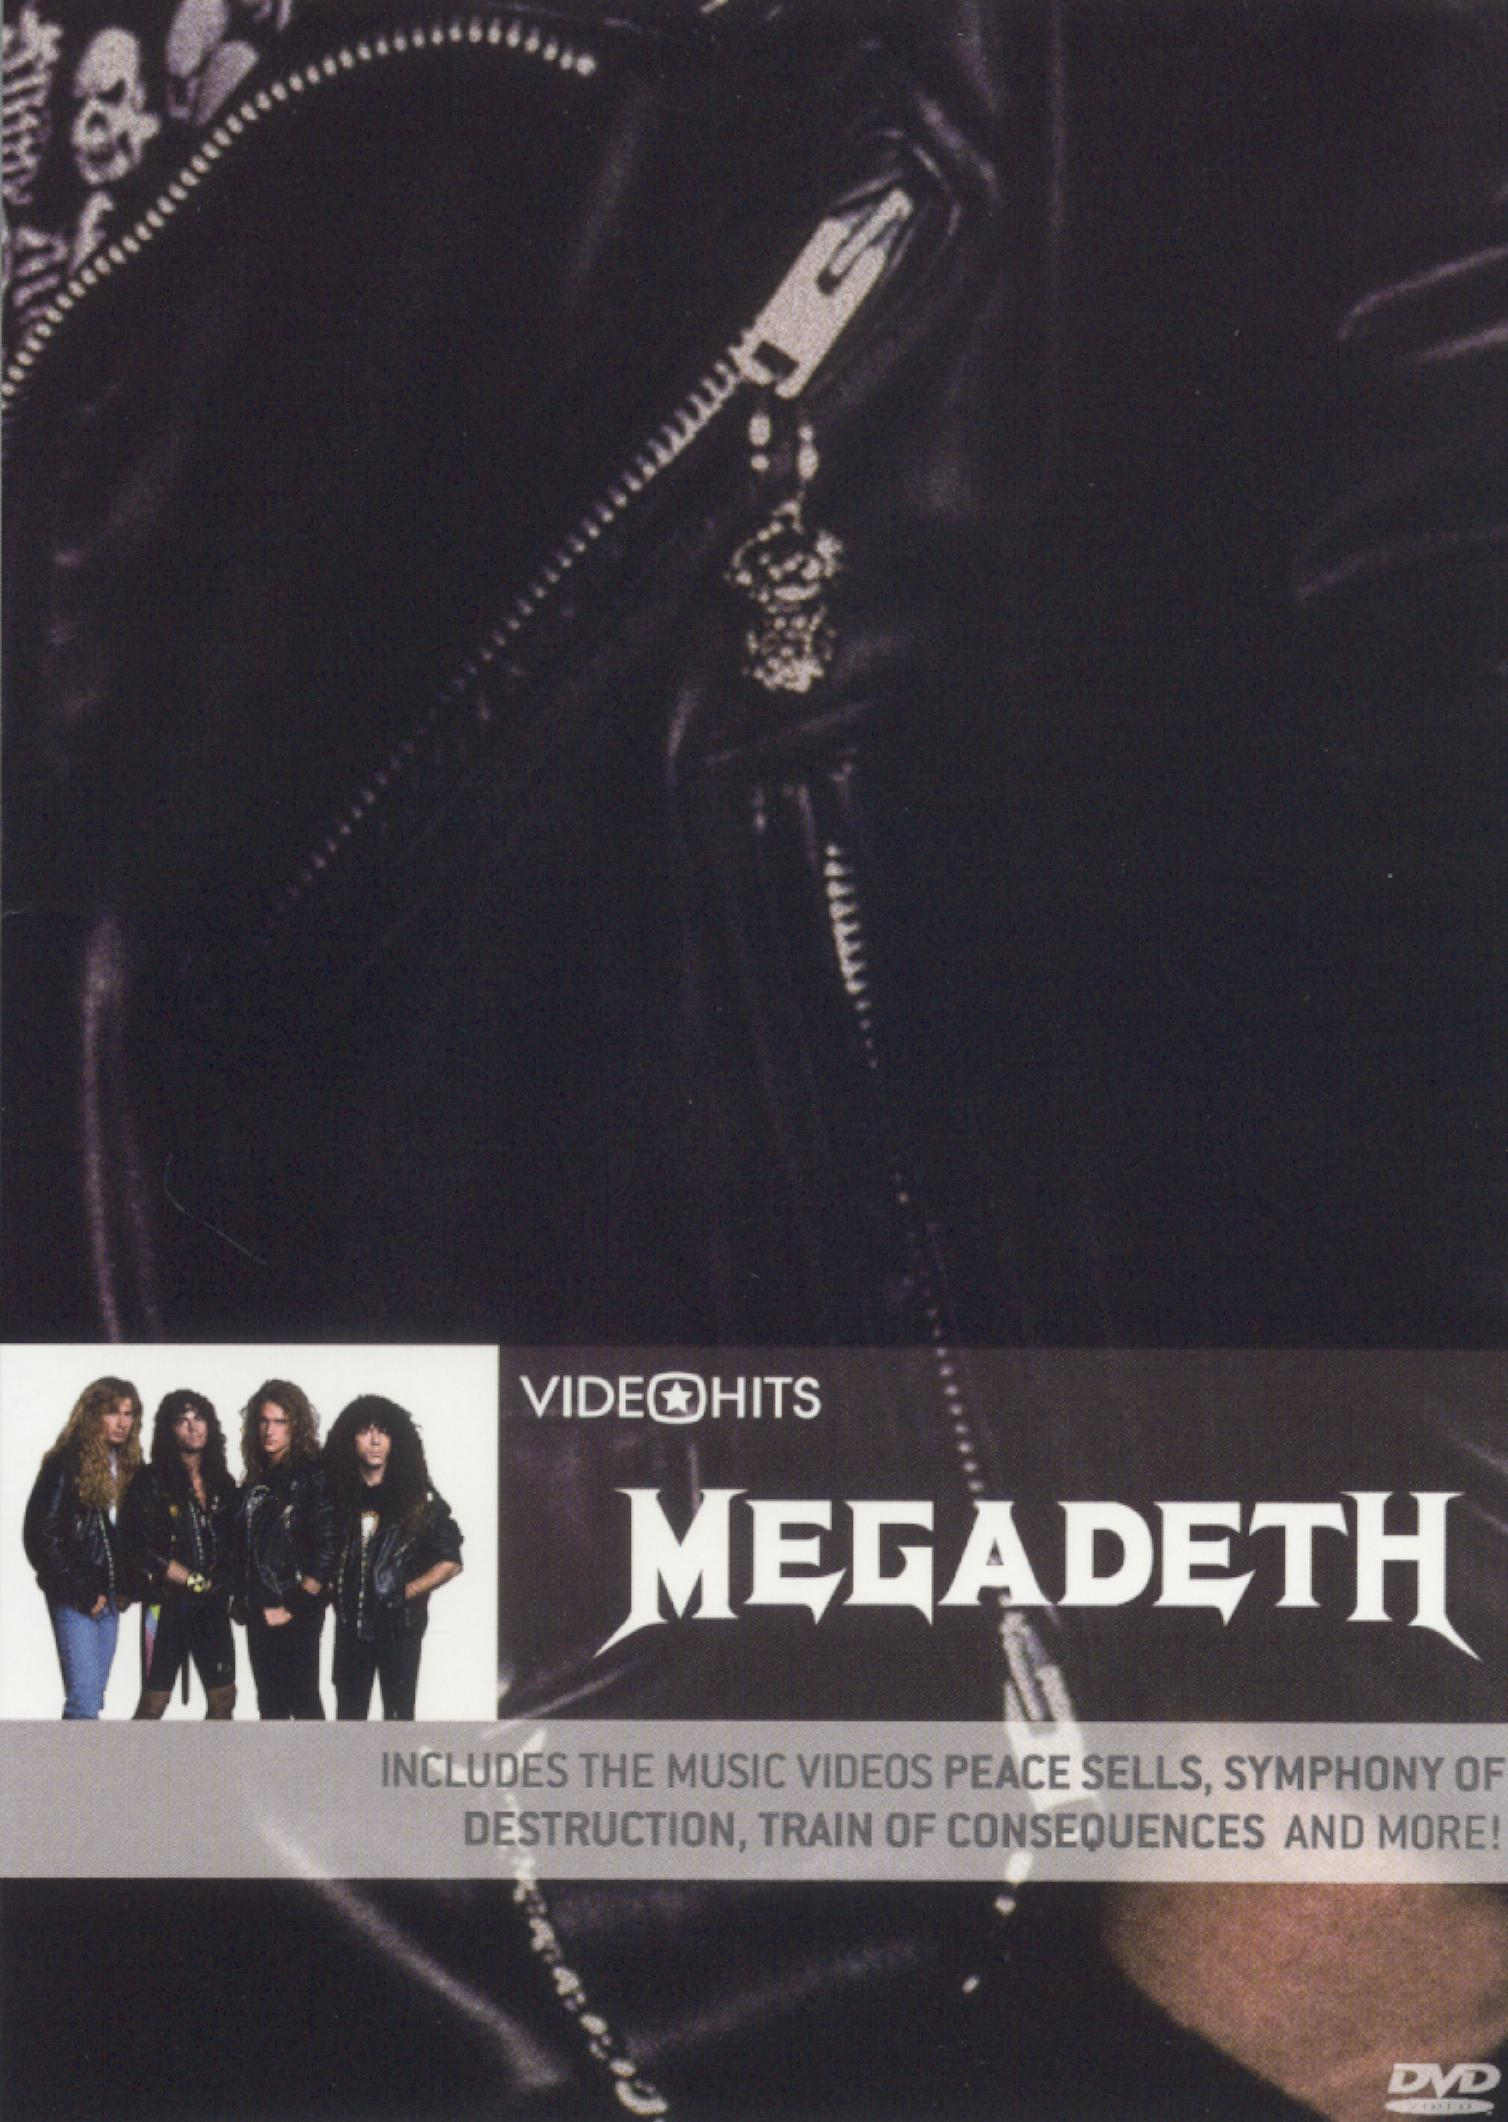 Video Hits: Megadeth